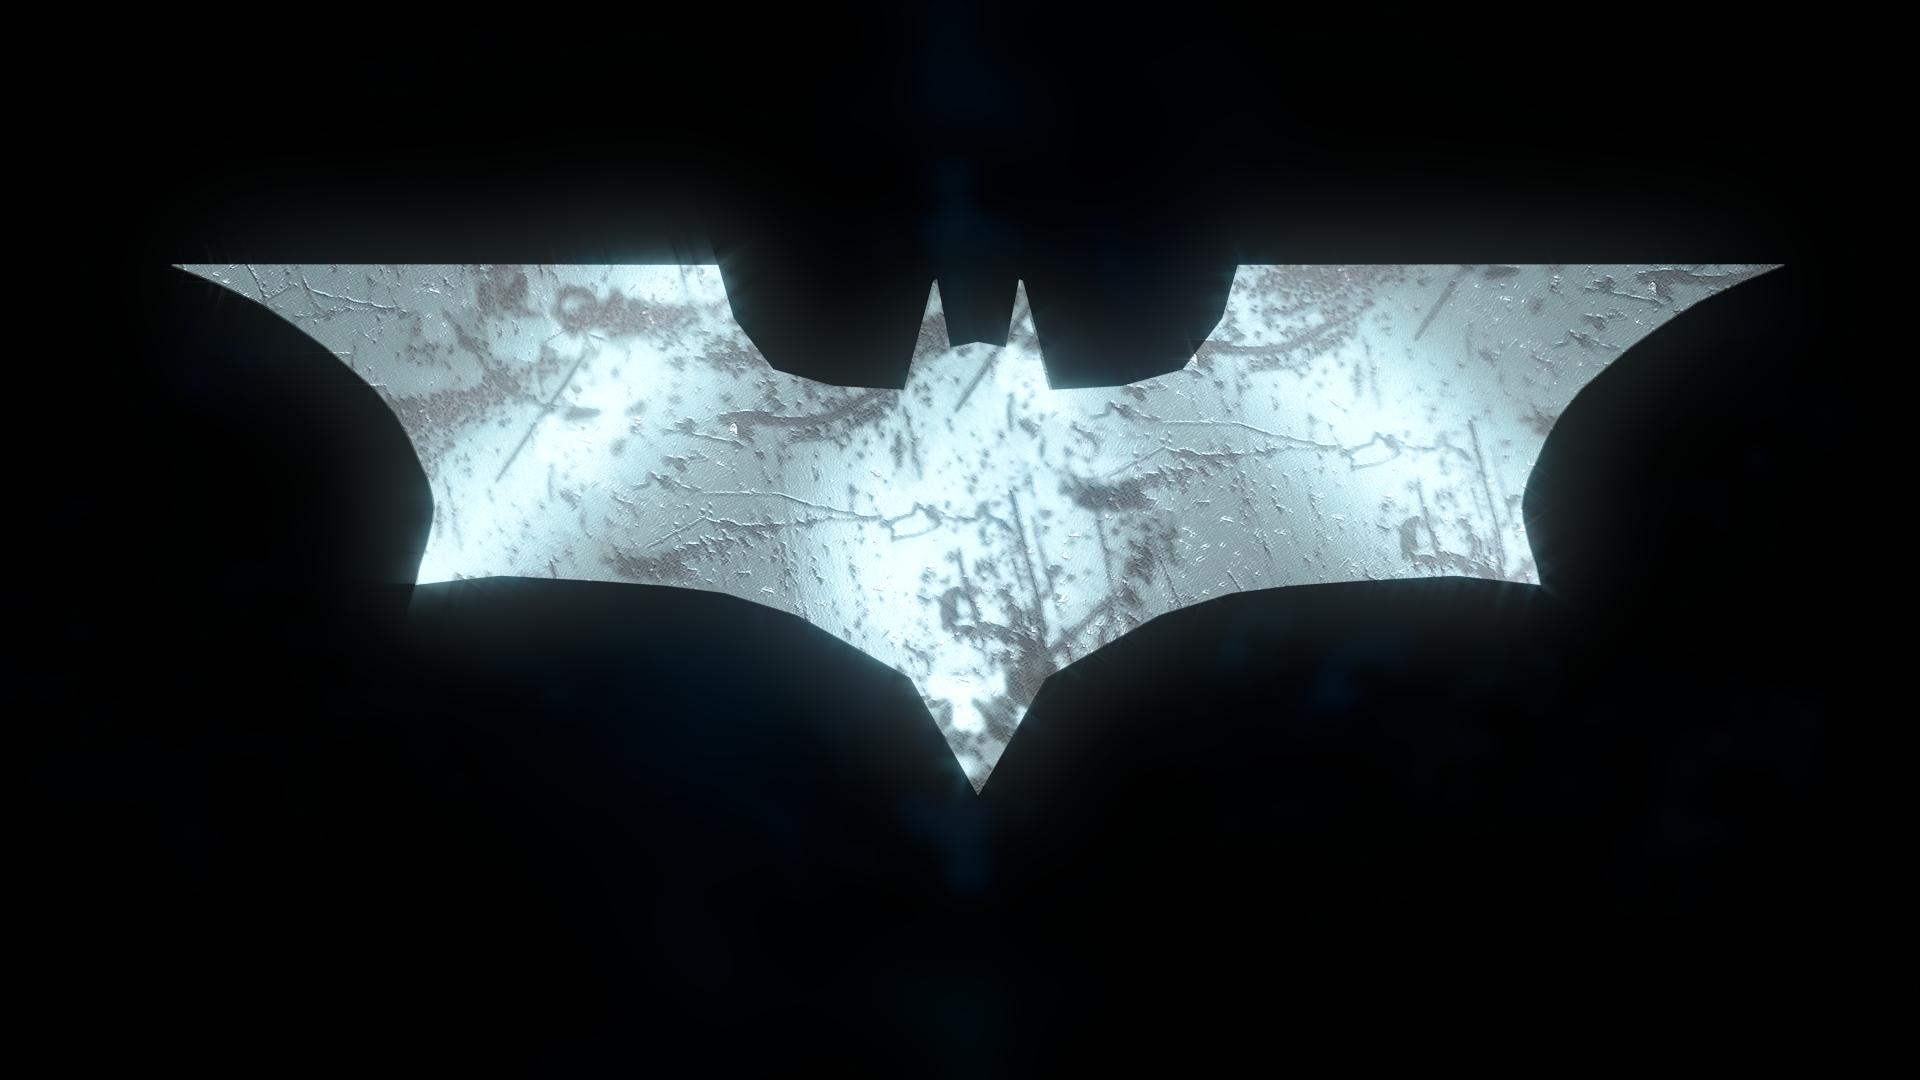 Batman Logo Wallpapers For Iphone Is 4K Wallpaper in 2019